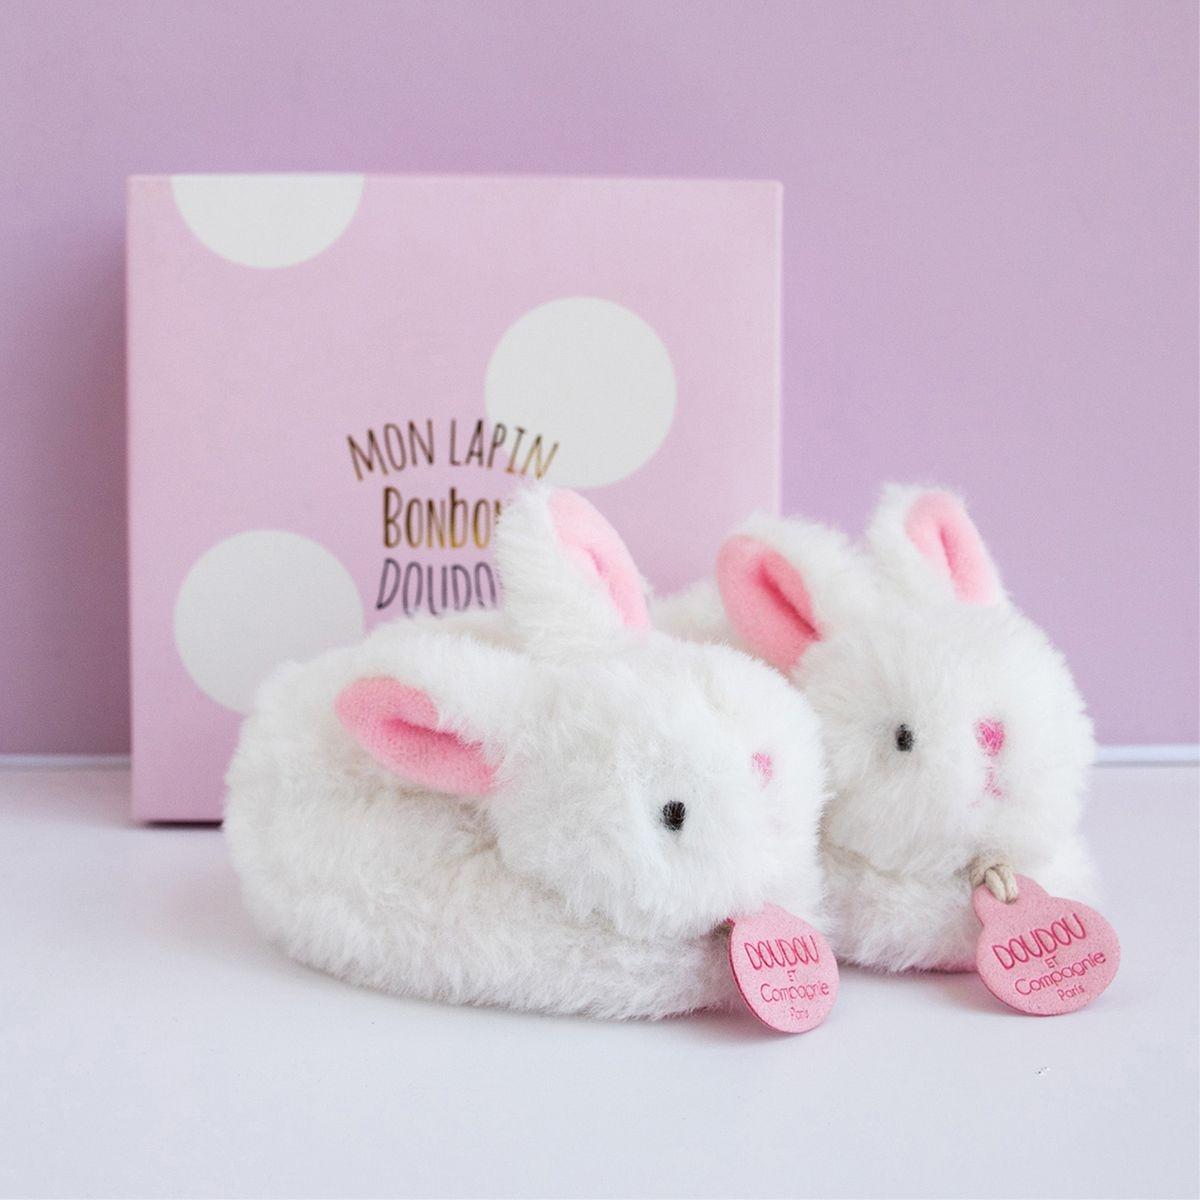 Mes petits chaussons Lapin bonbon